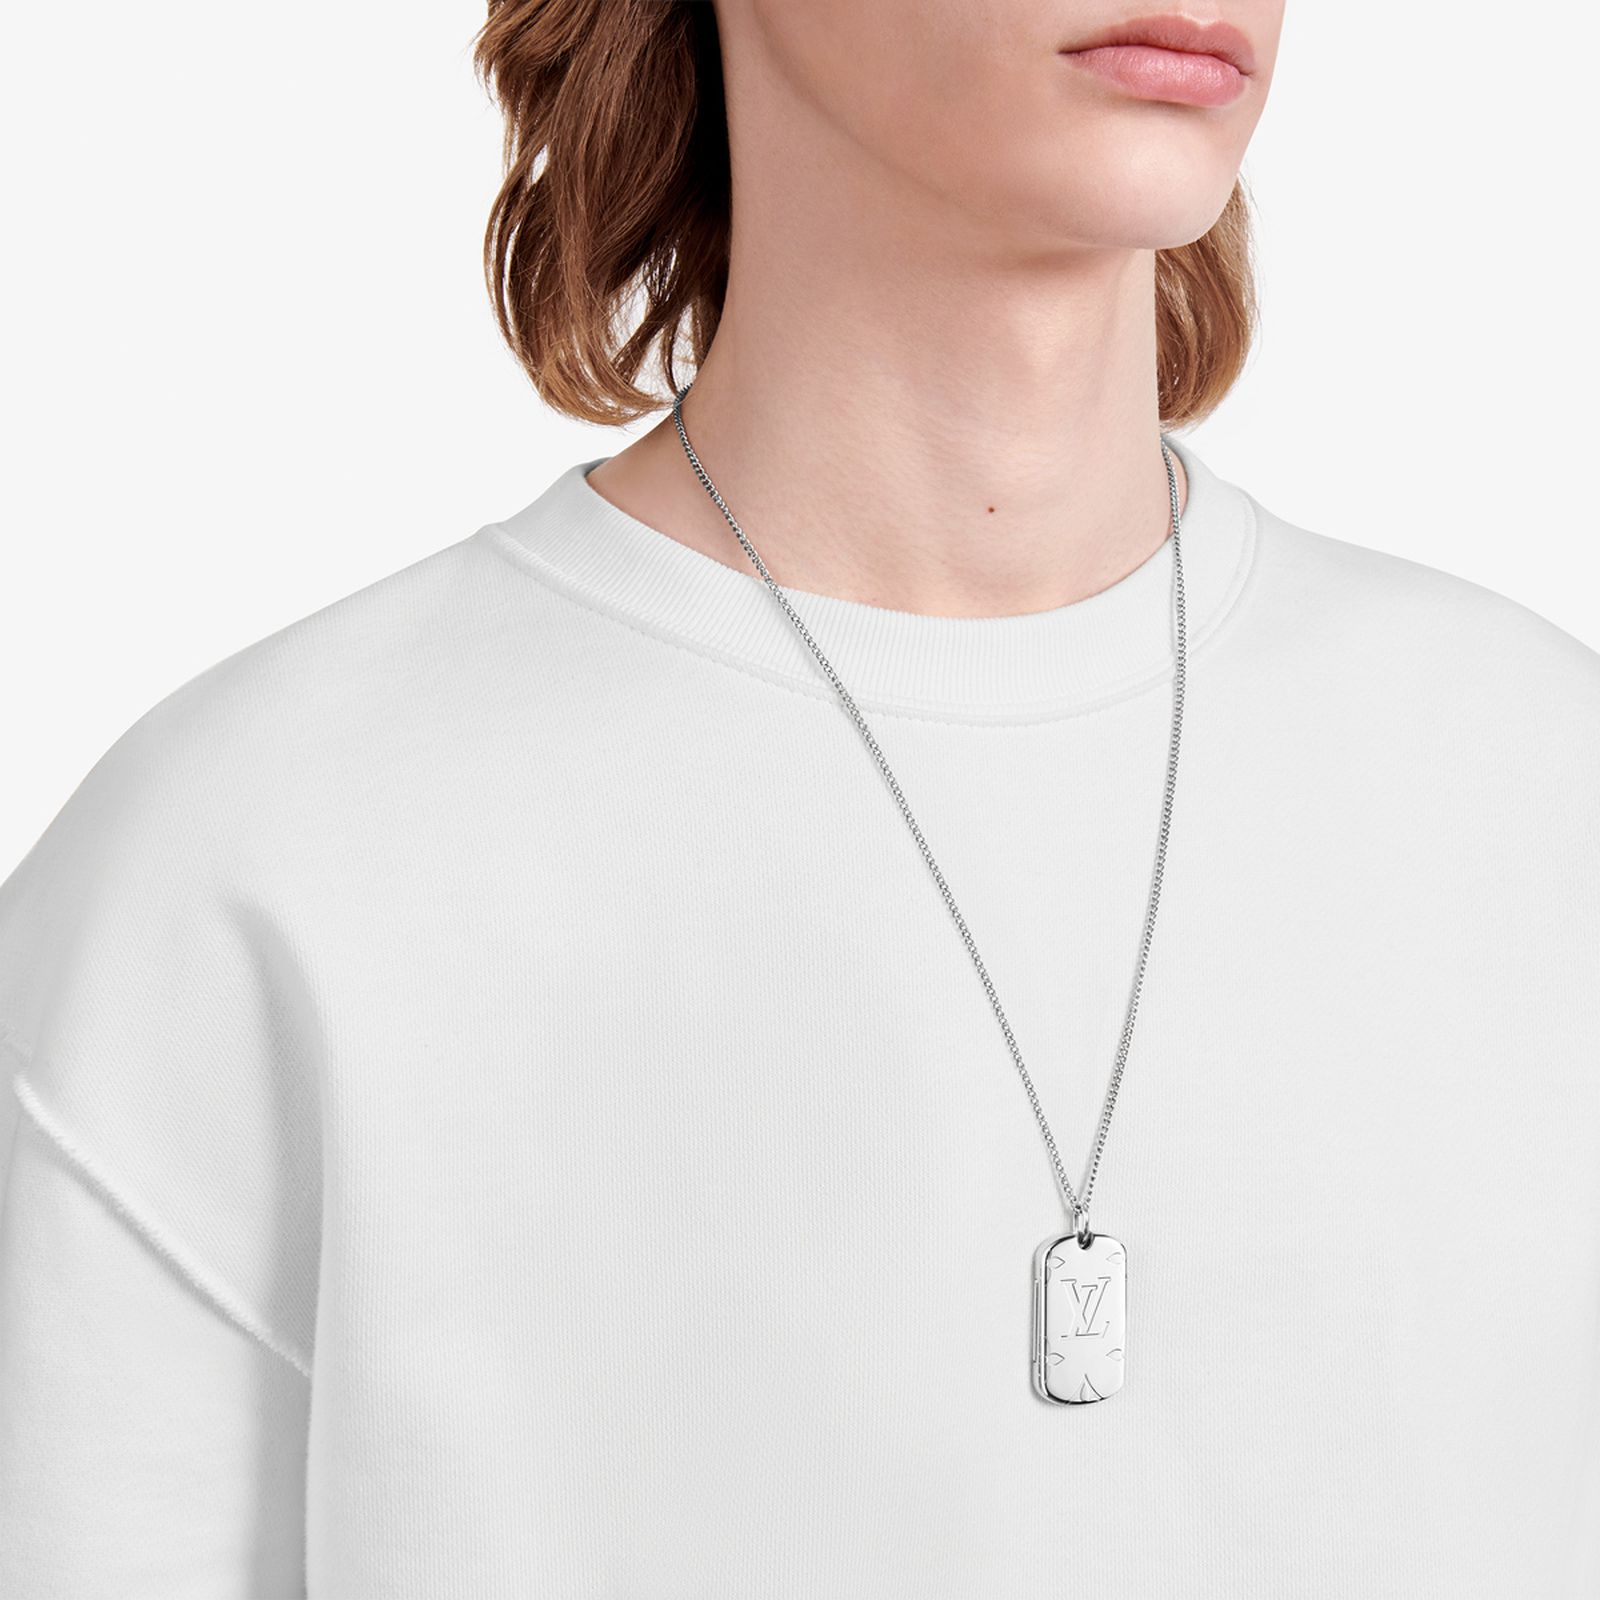 10louis-vuittons-mens-accessories-ss20